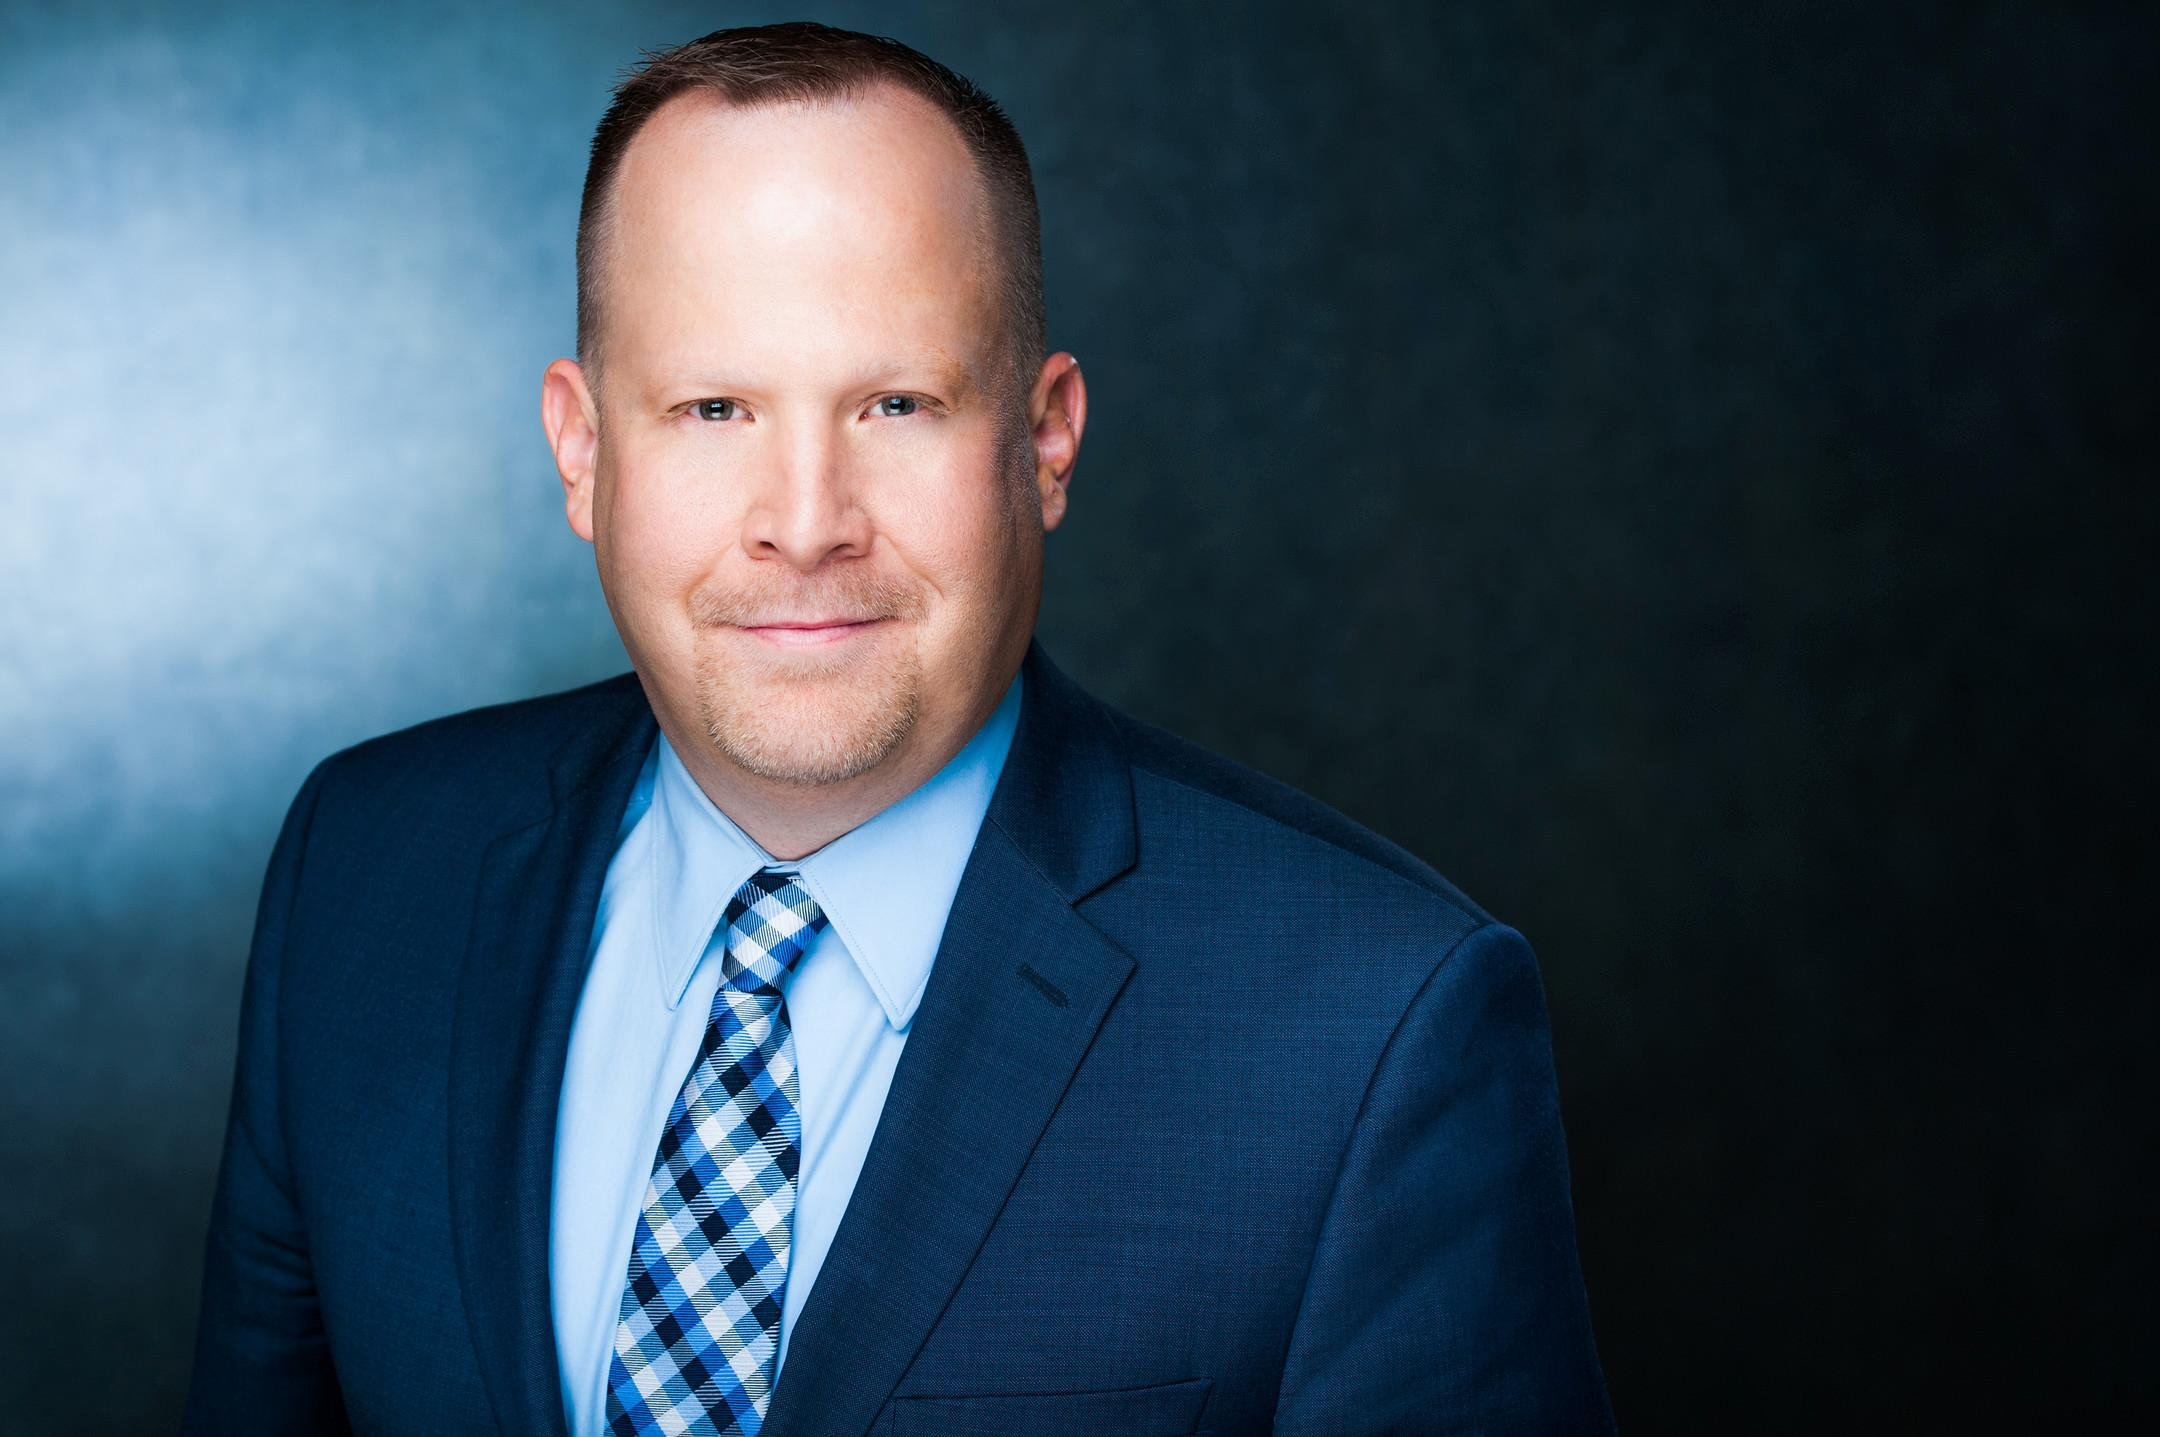 KEVIN D. LINDBLOM  Your Financial Advisor